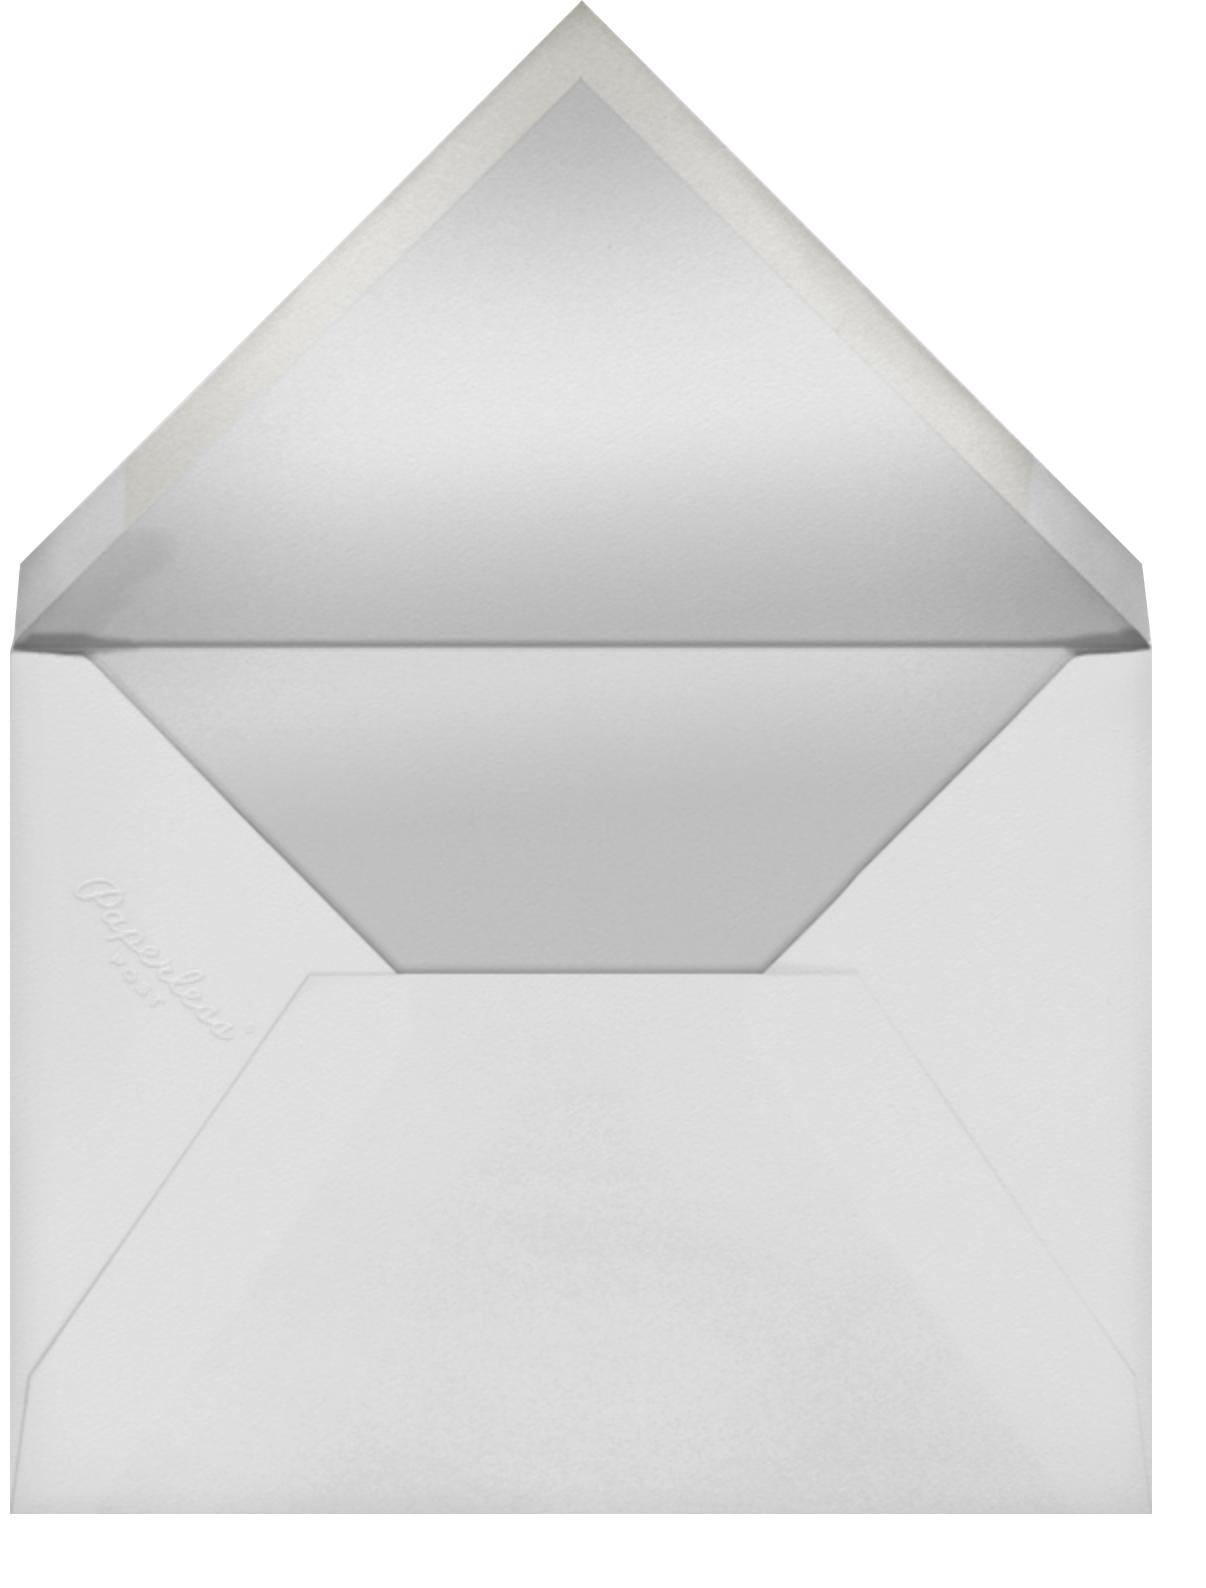 Lodden (Program) - Pink - Liberty - Envelope